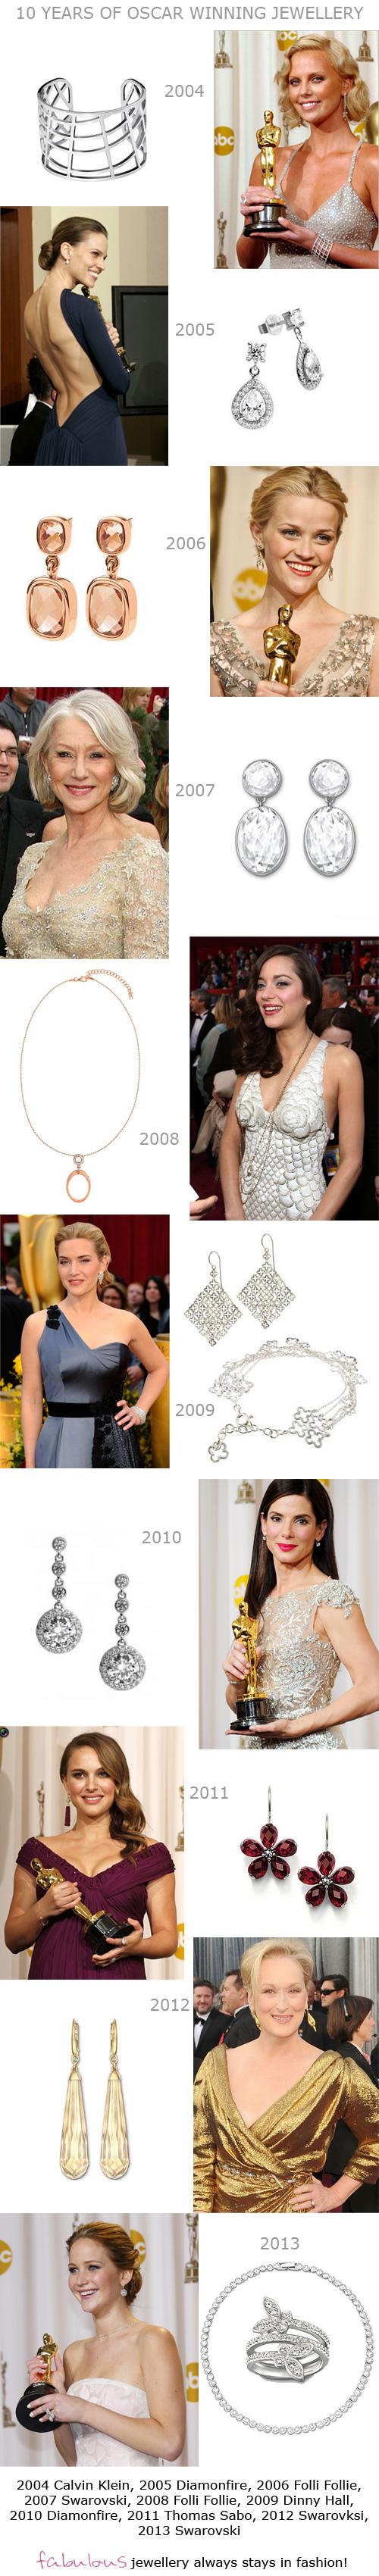 Oscar Winning Jewellery